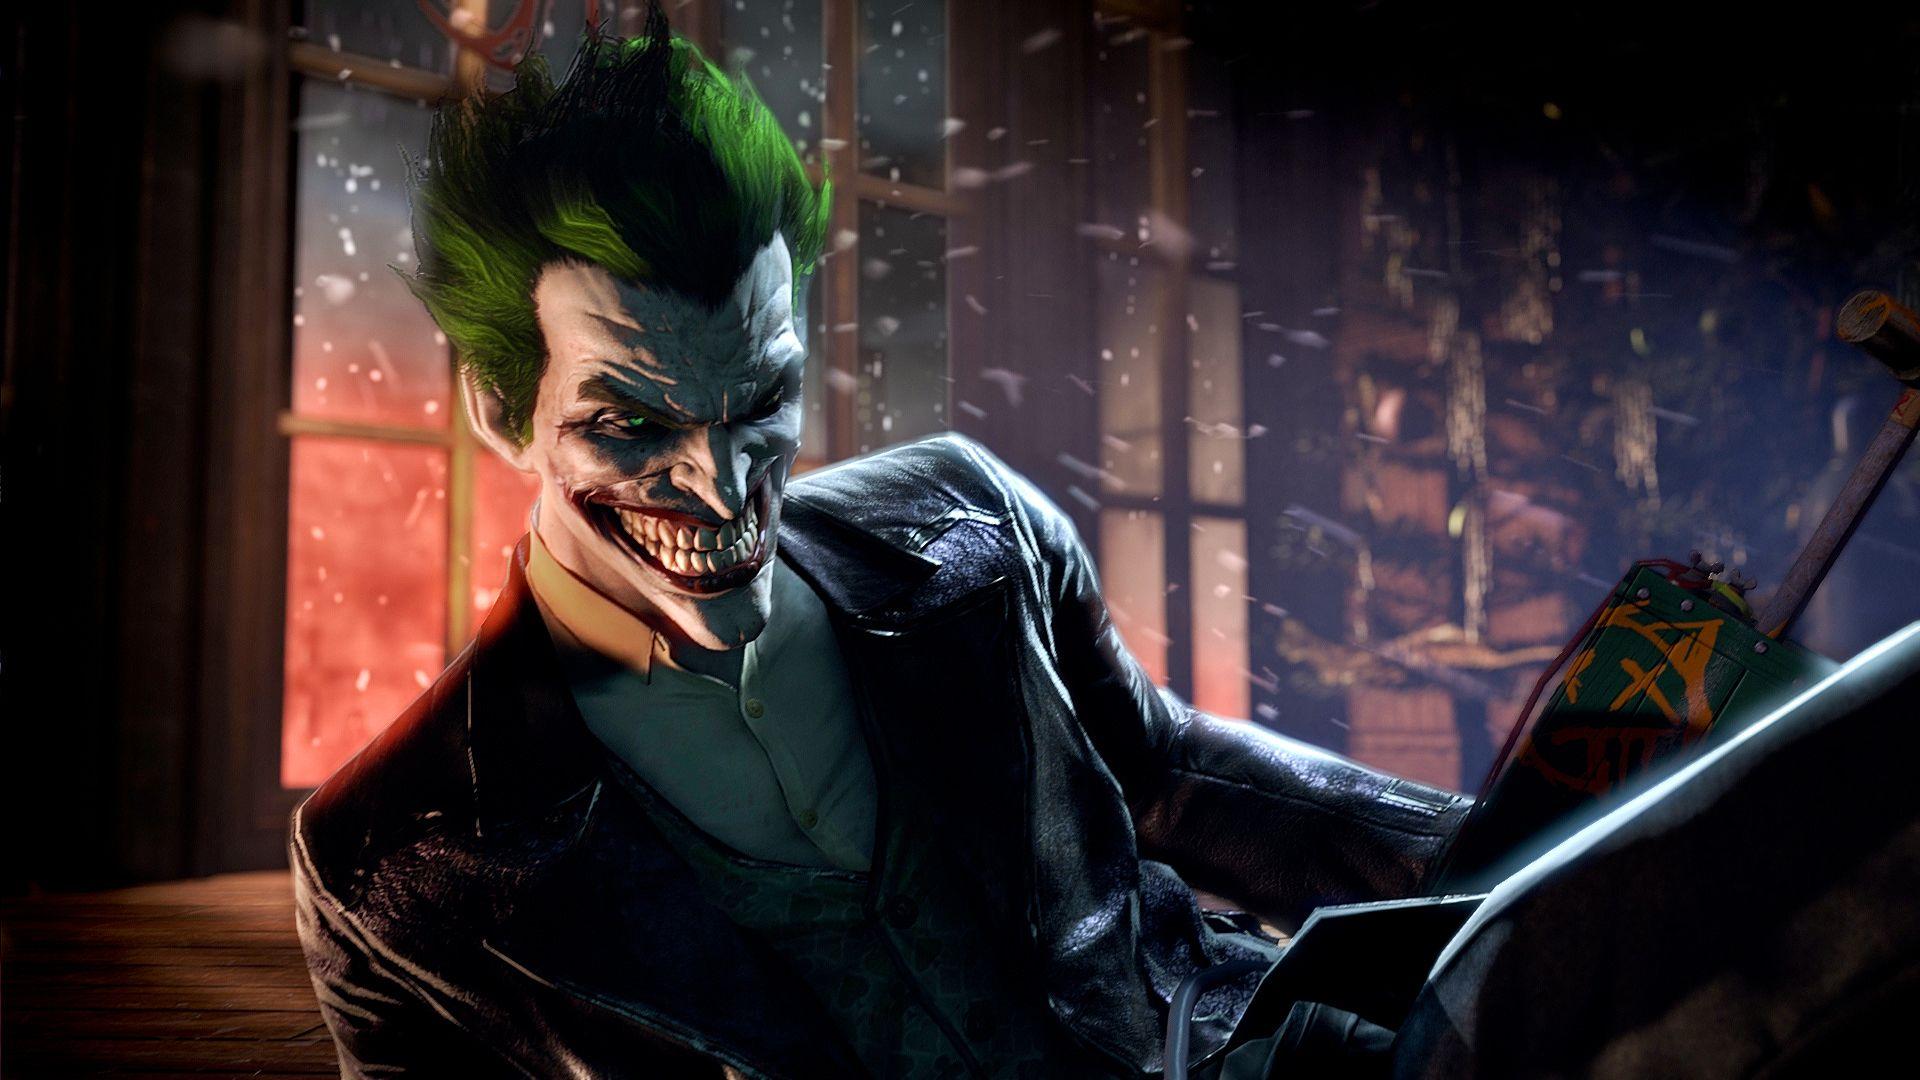 New Batman Arkham Origins Trailer Released Voice Actors Announced